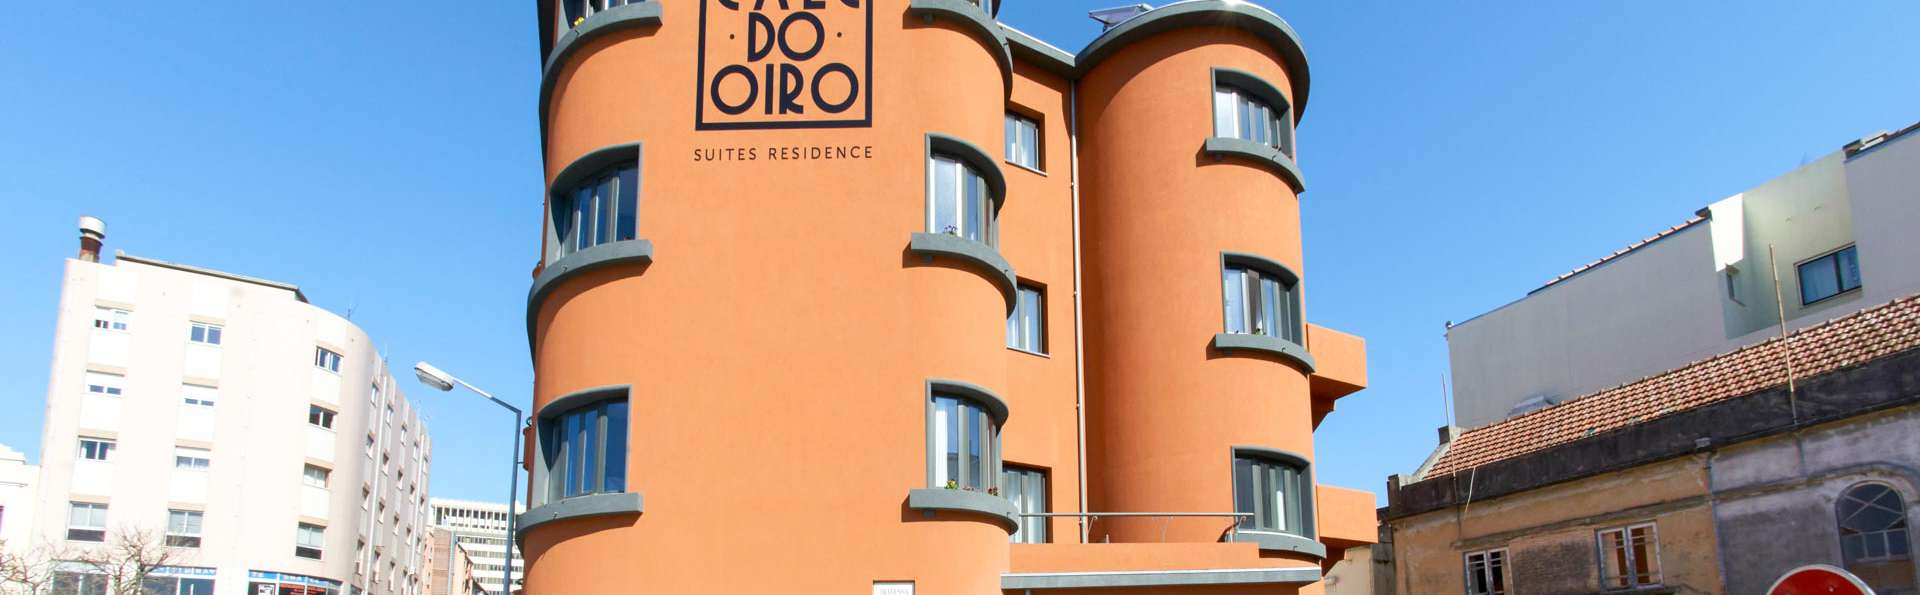 Hotel do Mercado - EDIT_FRONT_02.jpg